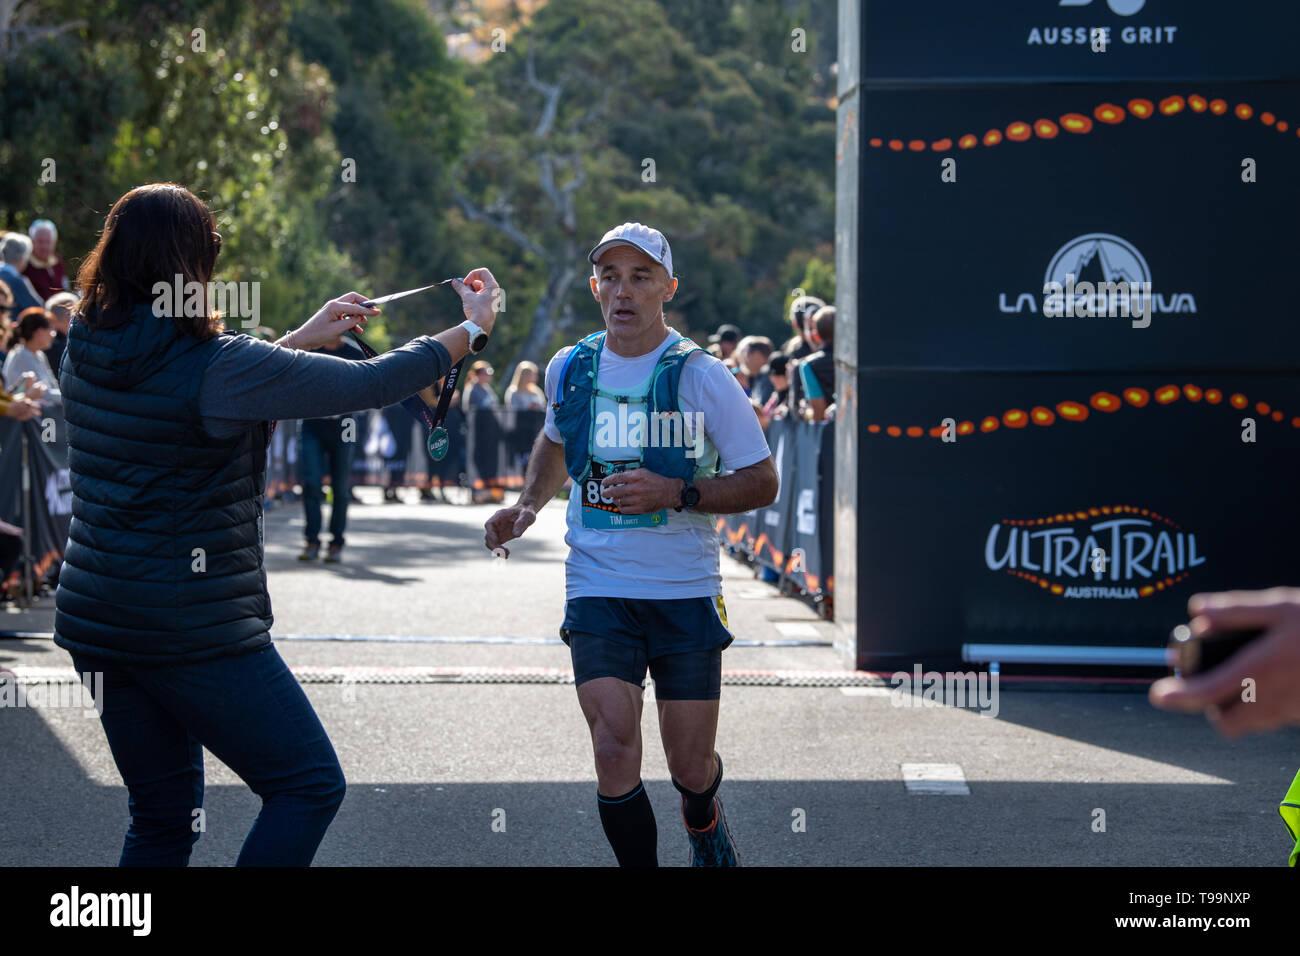 Blue Mountains, Australia - April 16 2019: Ultra-Trail Australia UTA11 race. Runner Tim Lovettat the finish line receiving participation medal. - Stock Image